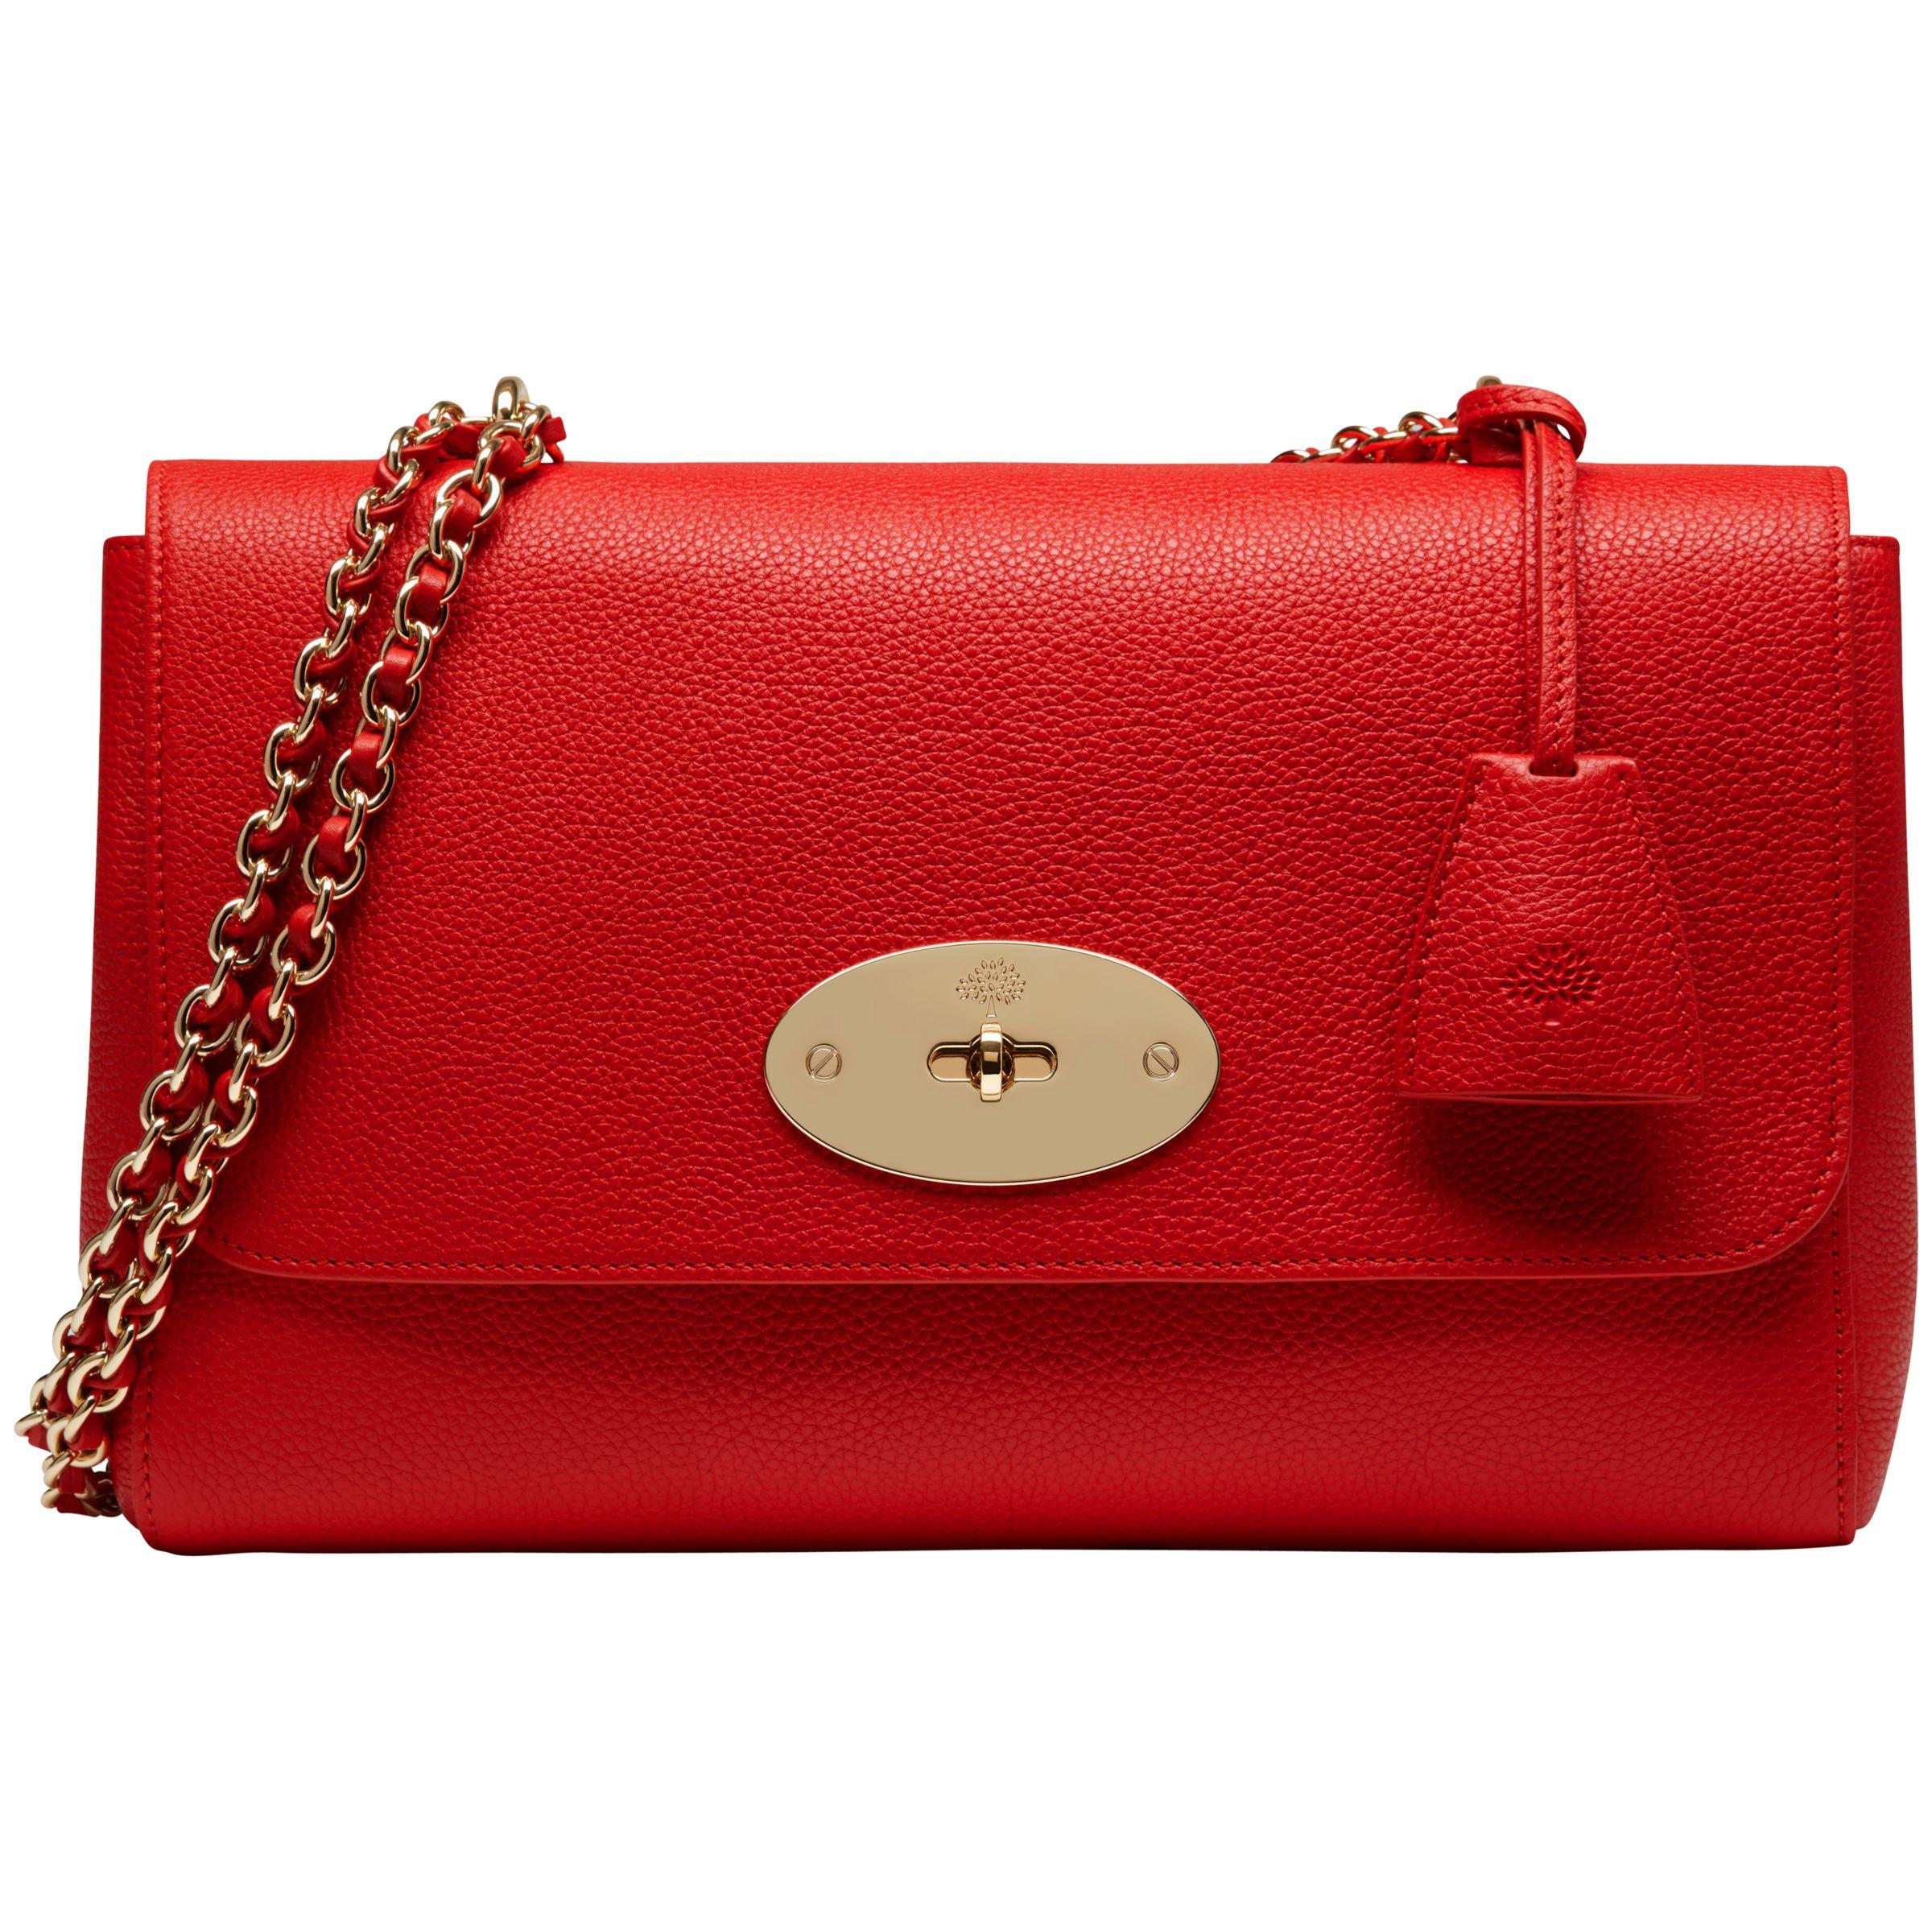 217b4c284f88 Mulberry Medium Lily Leather Shoulder Bag